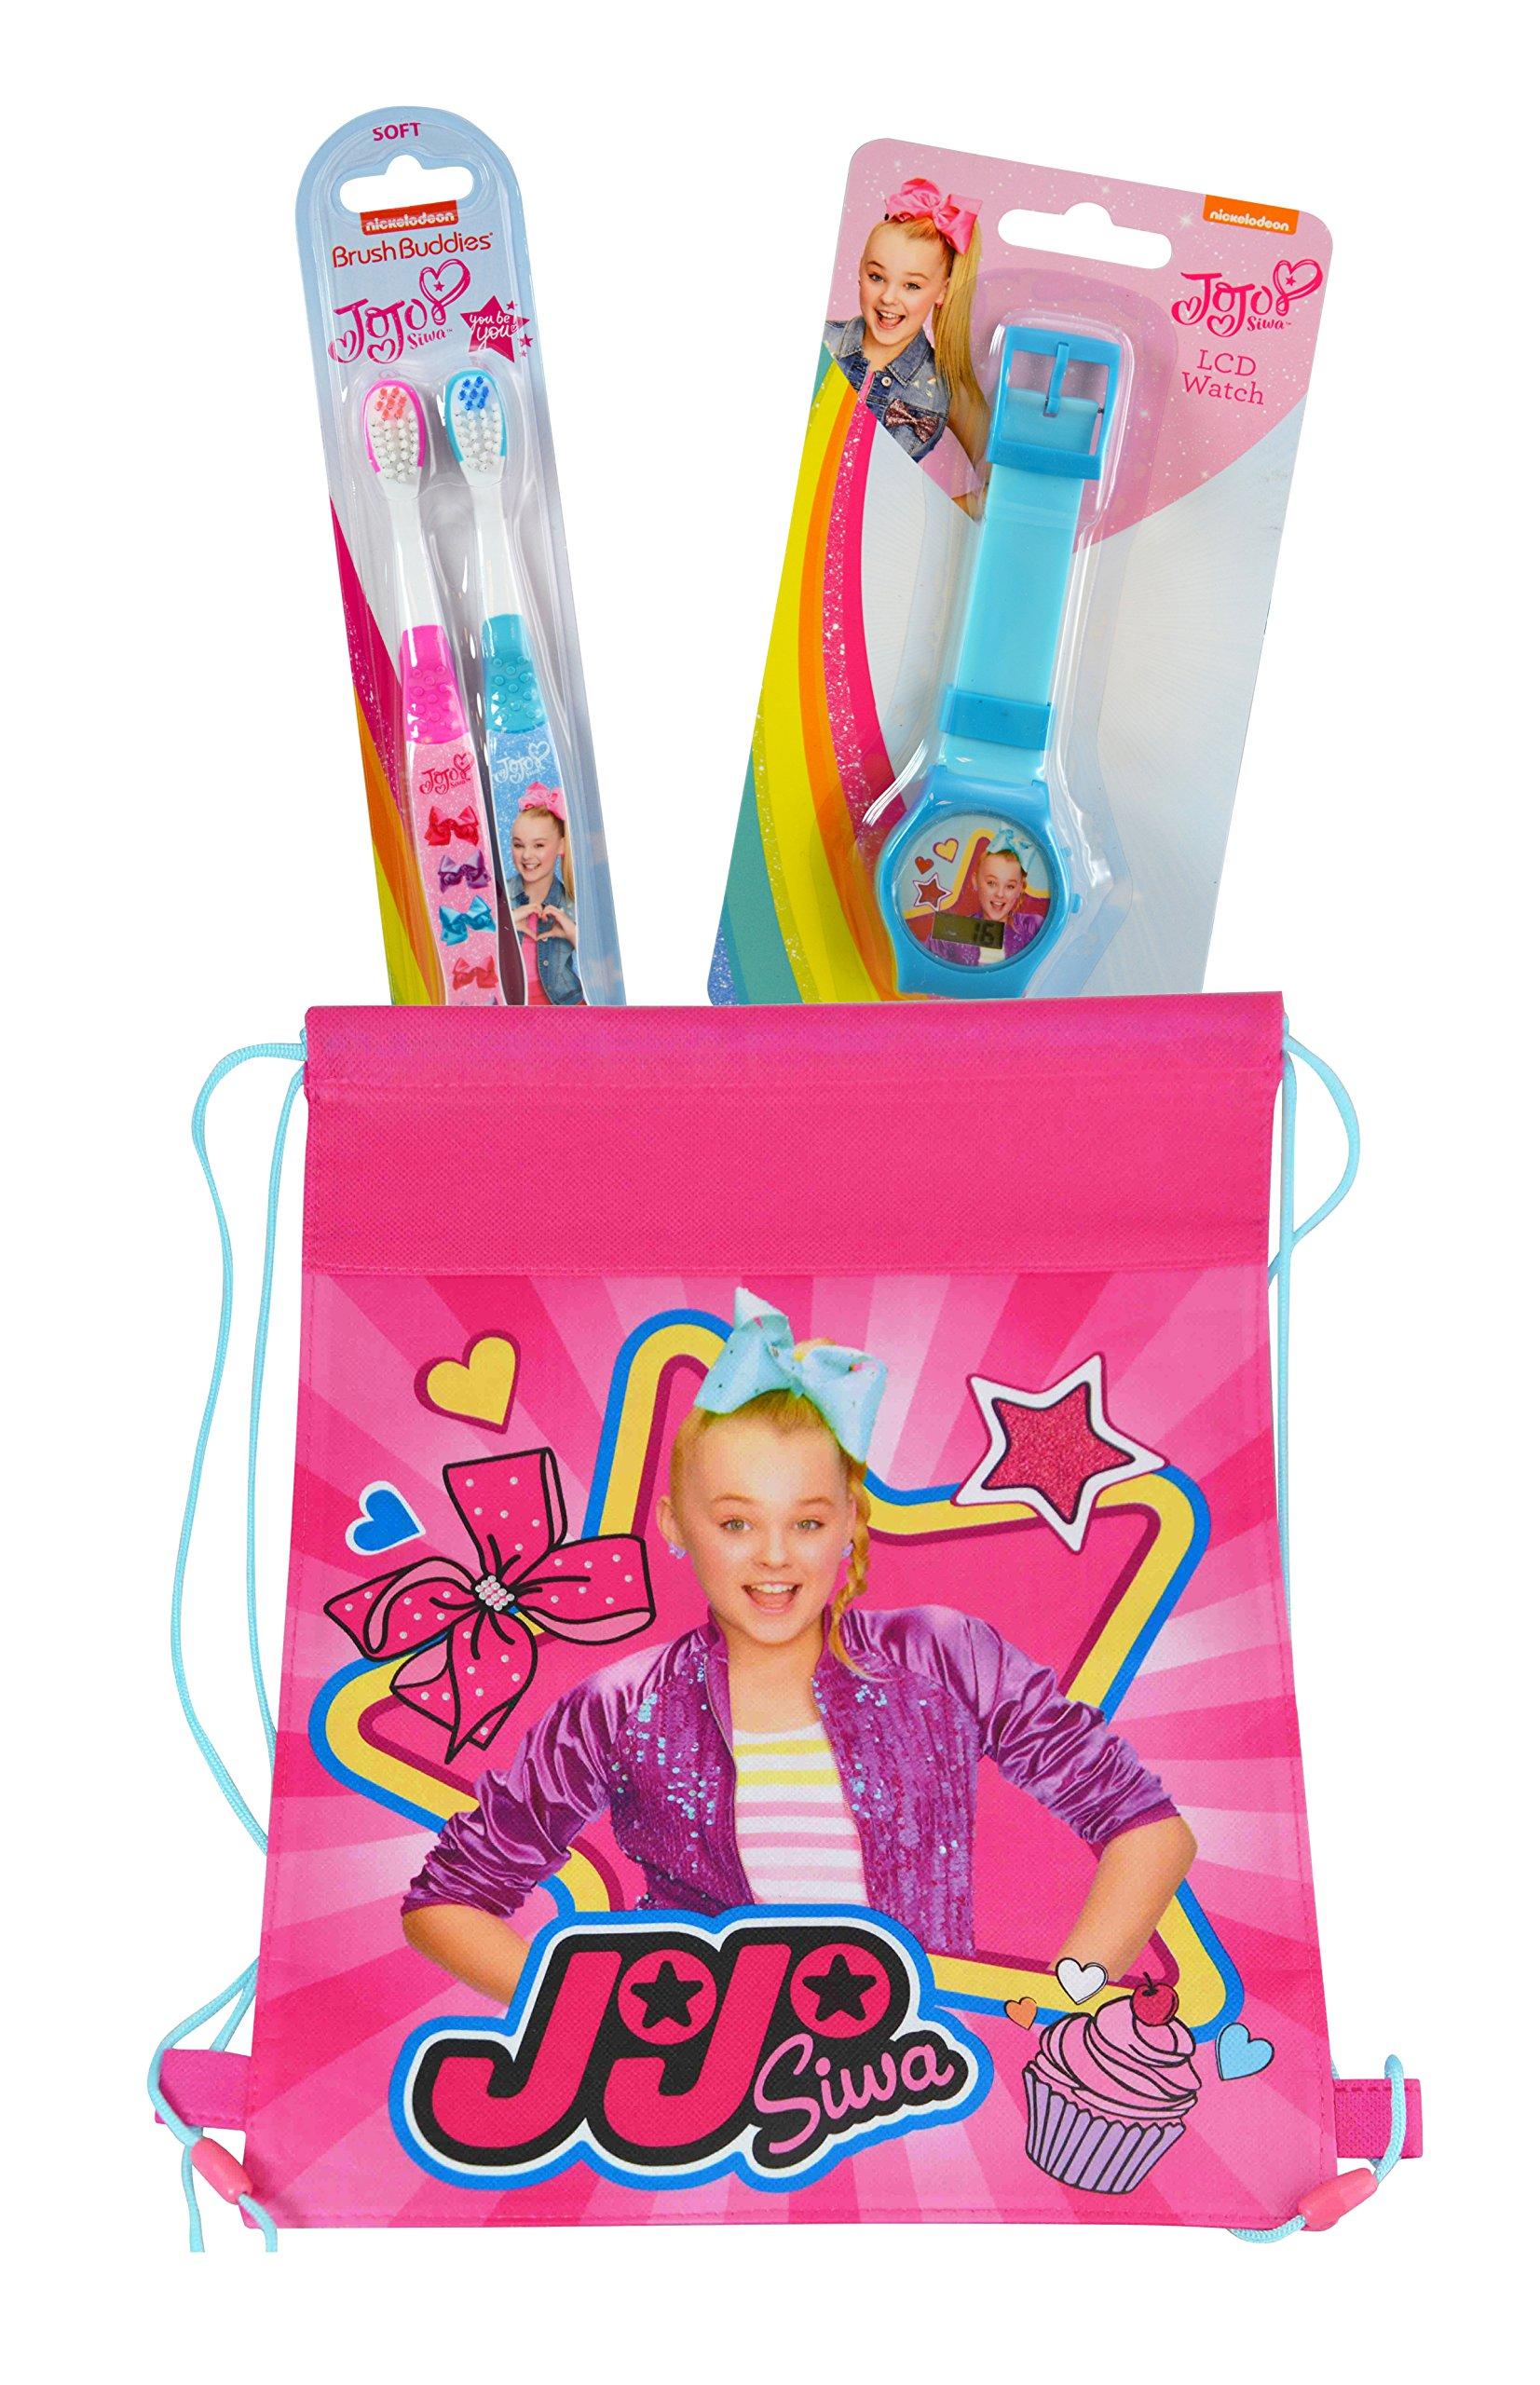 JoJo Siwa Travel Fun Set, Digital Watch and 2pk Kids Toothbrush with Travel Sling Bag by JoJo Siwa (Image #1)